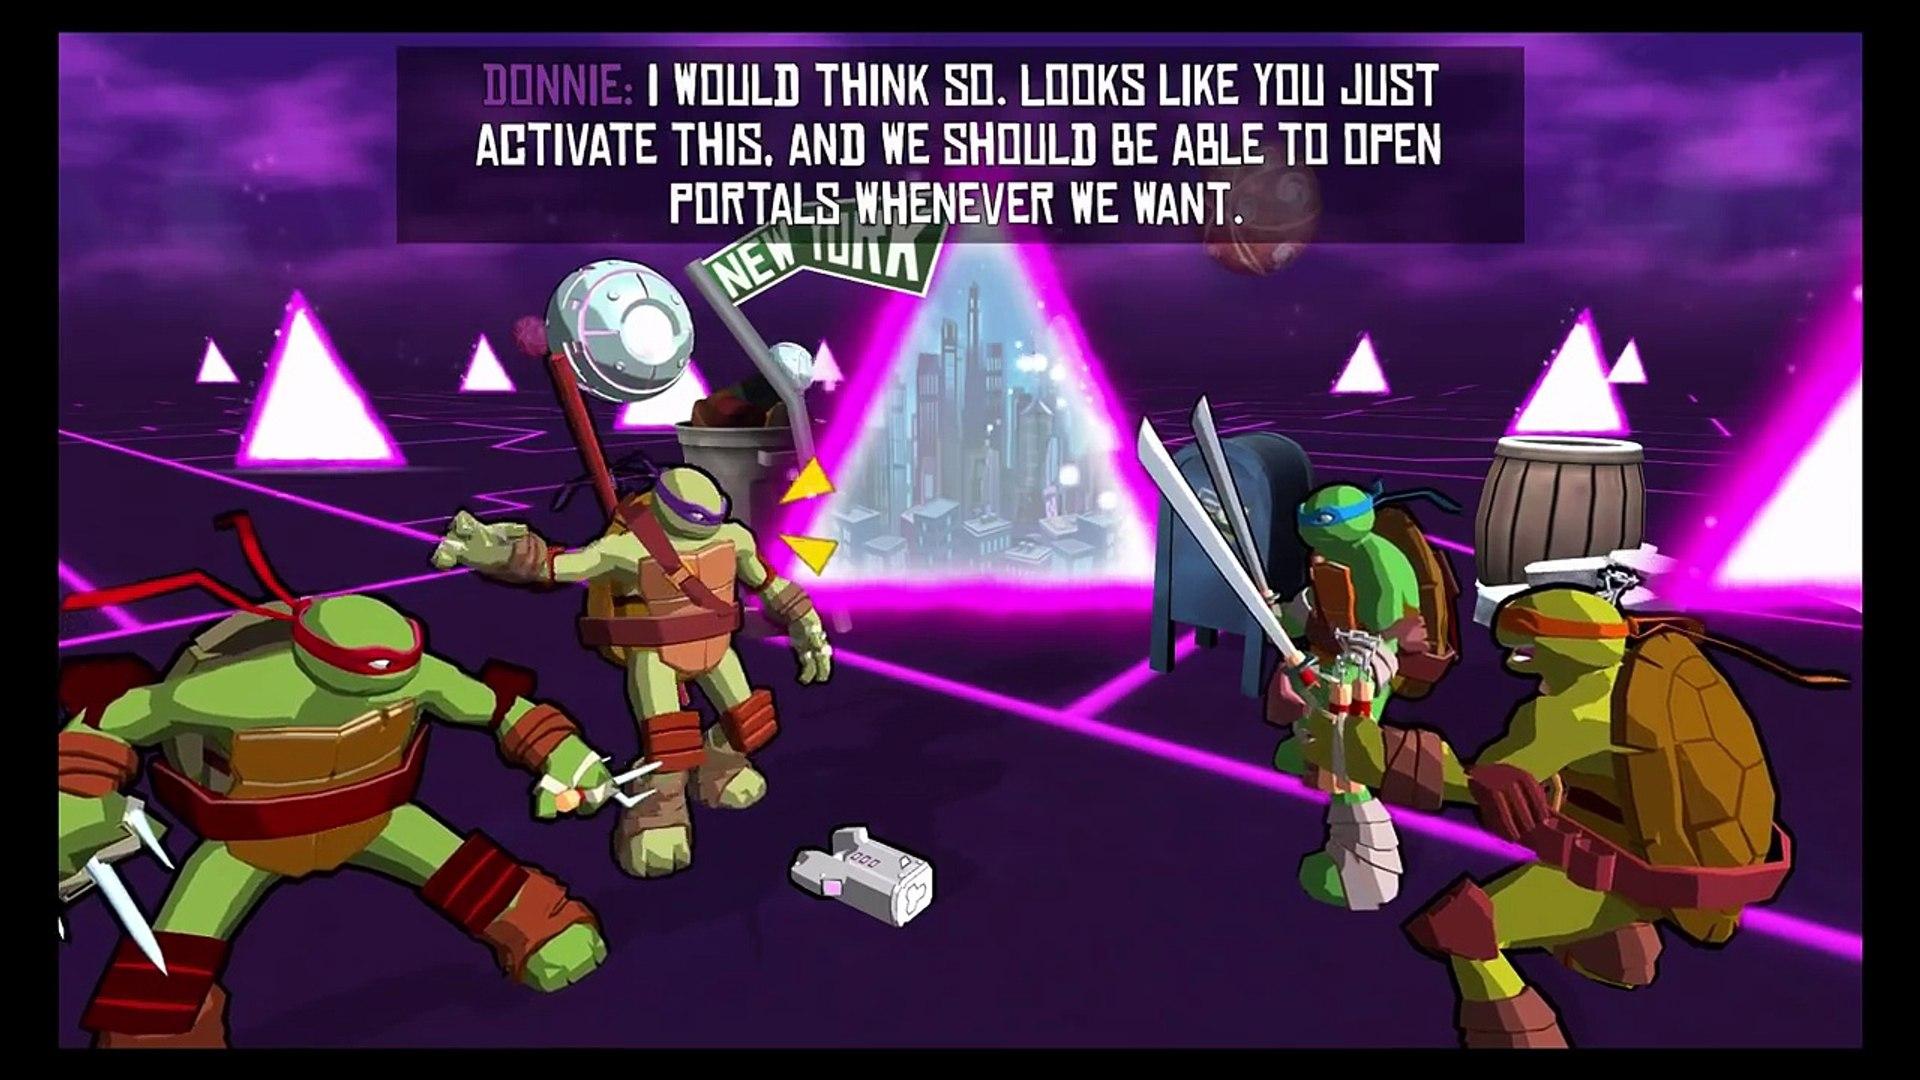 TMNT - Portal Power - Nickelodeon Games